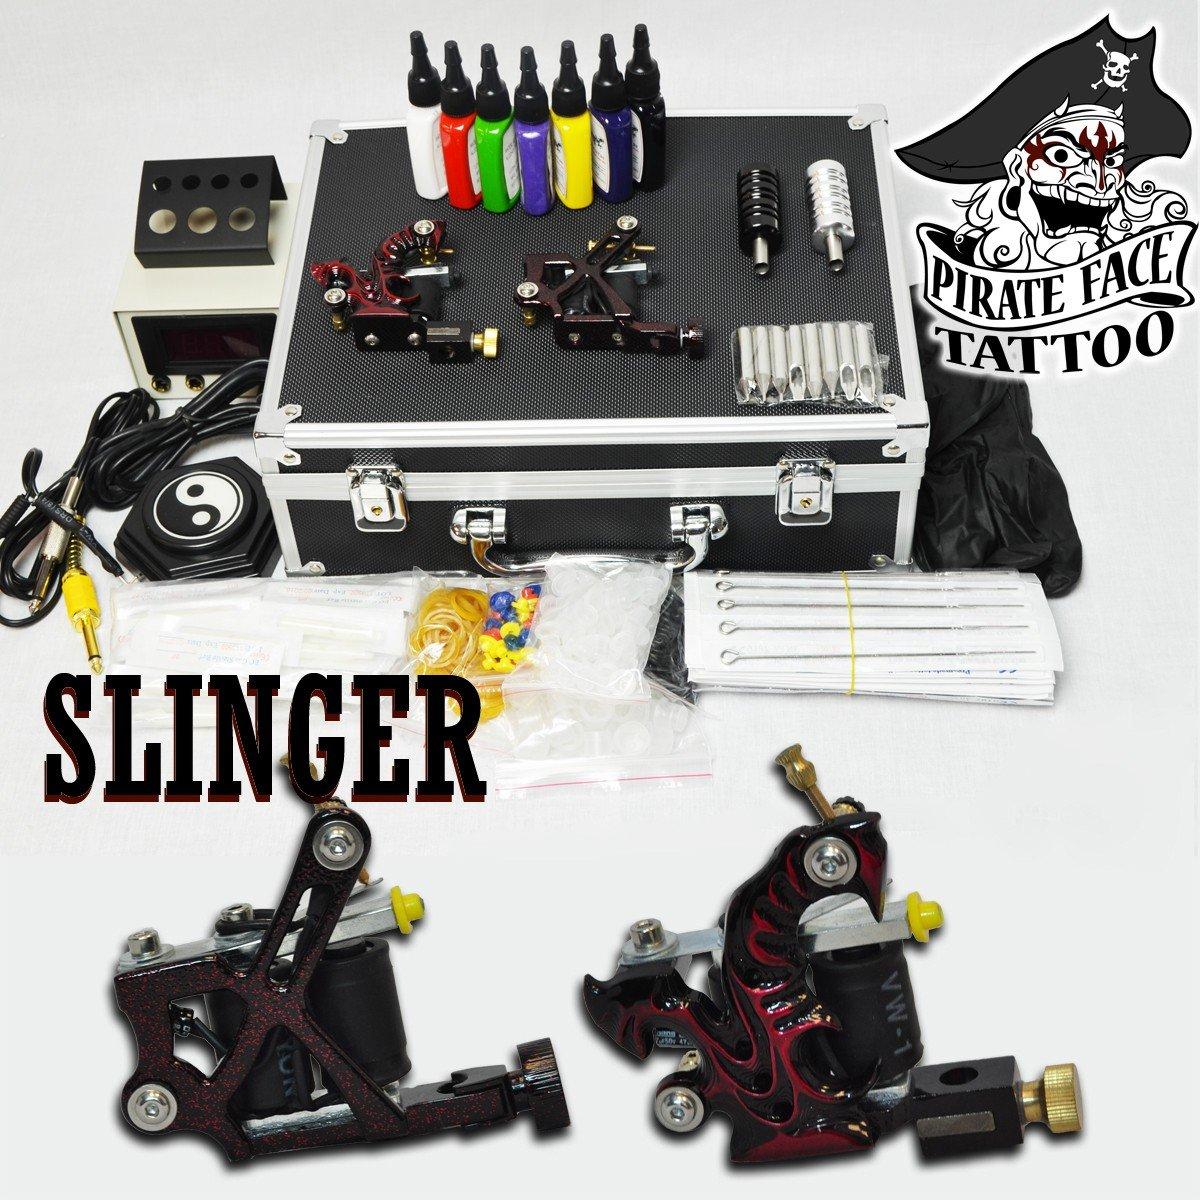 Amazon.com: SLINGER BASIC Tattoo Kit by Pirate Face Tattoo / 2 ...